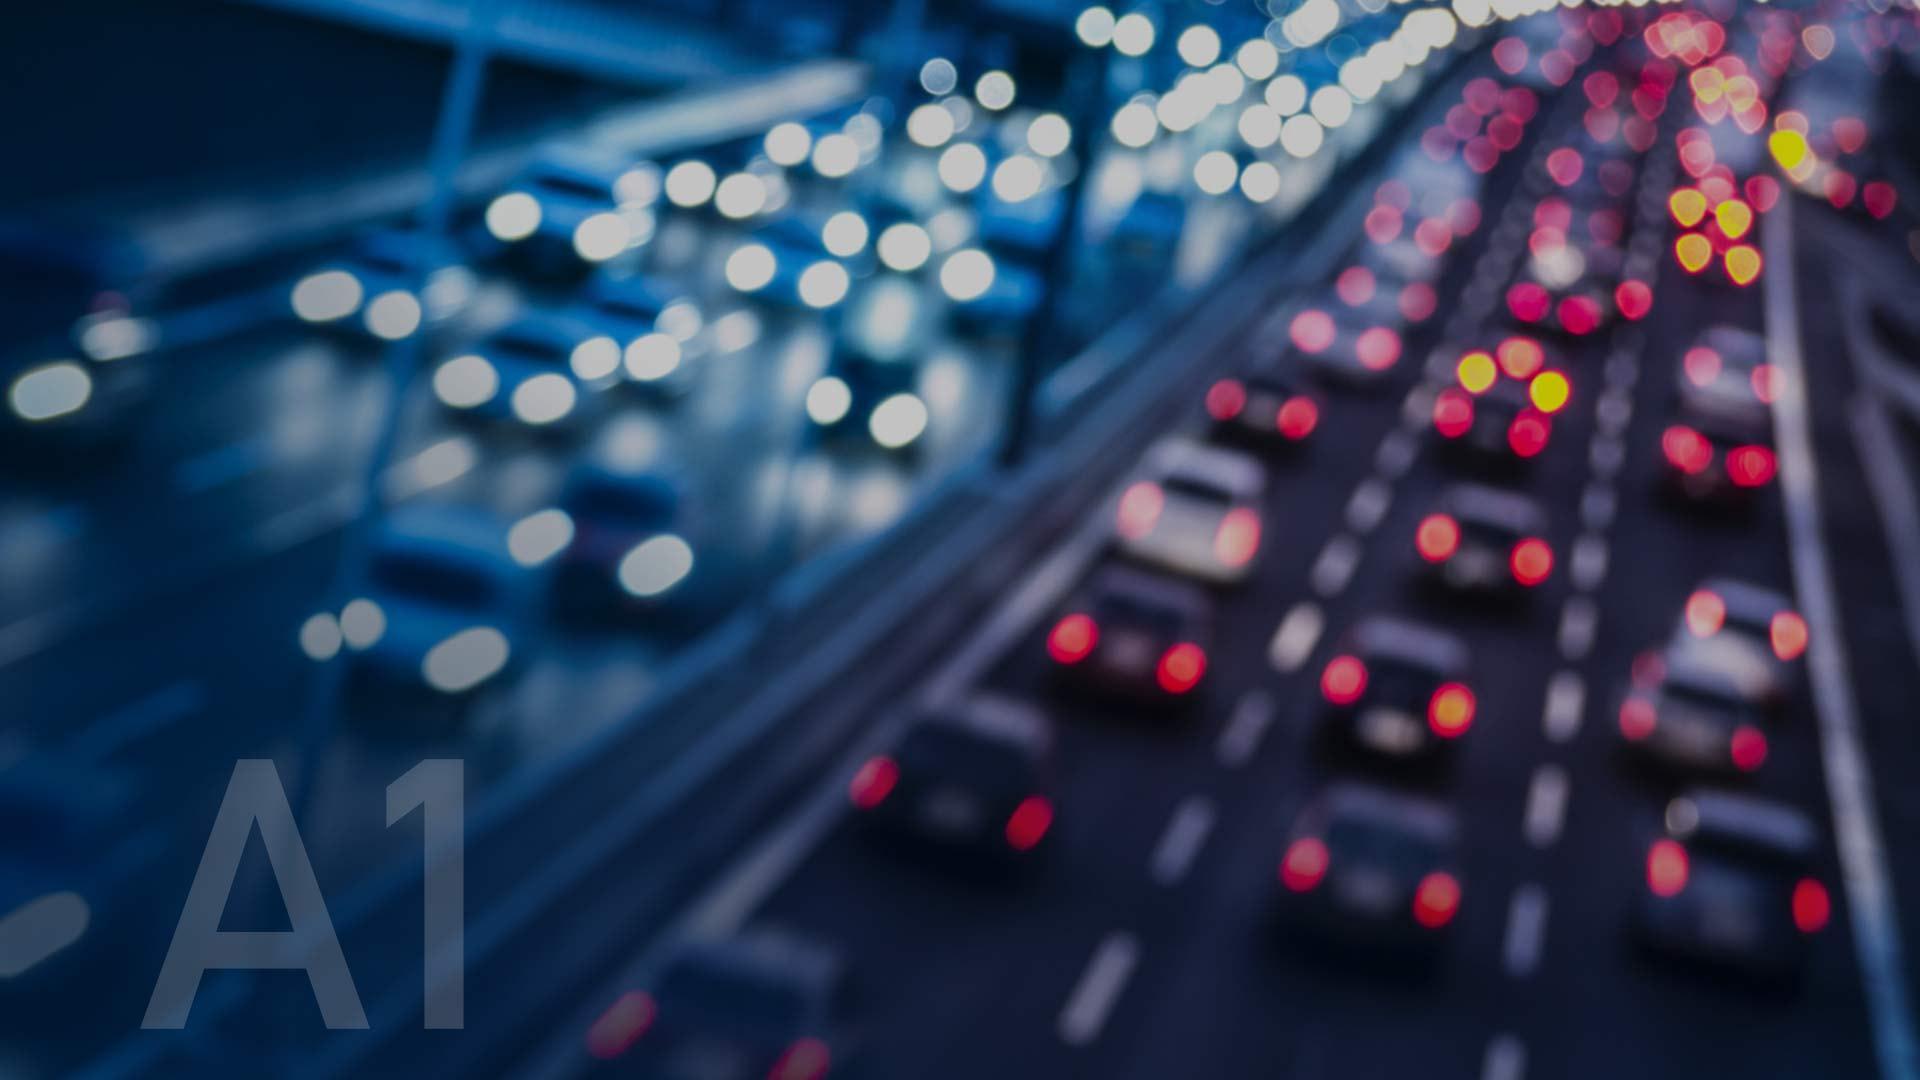 RTL Today - Traffic